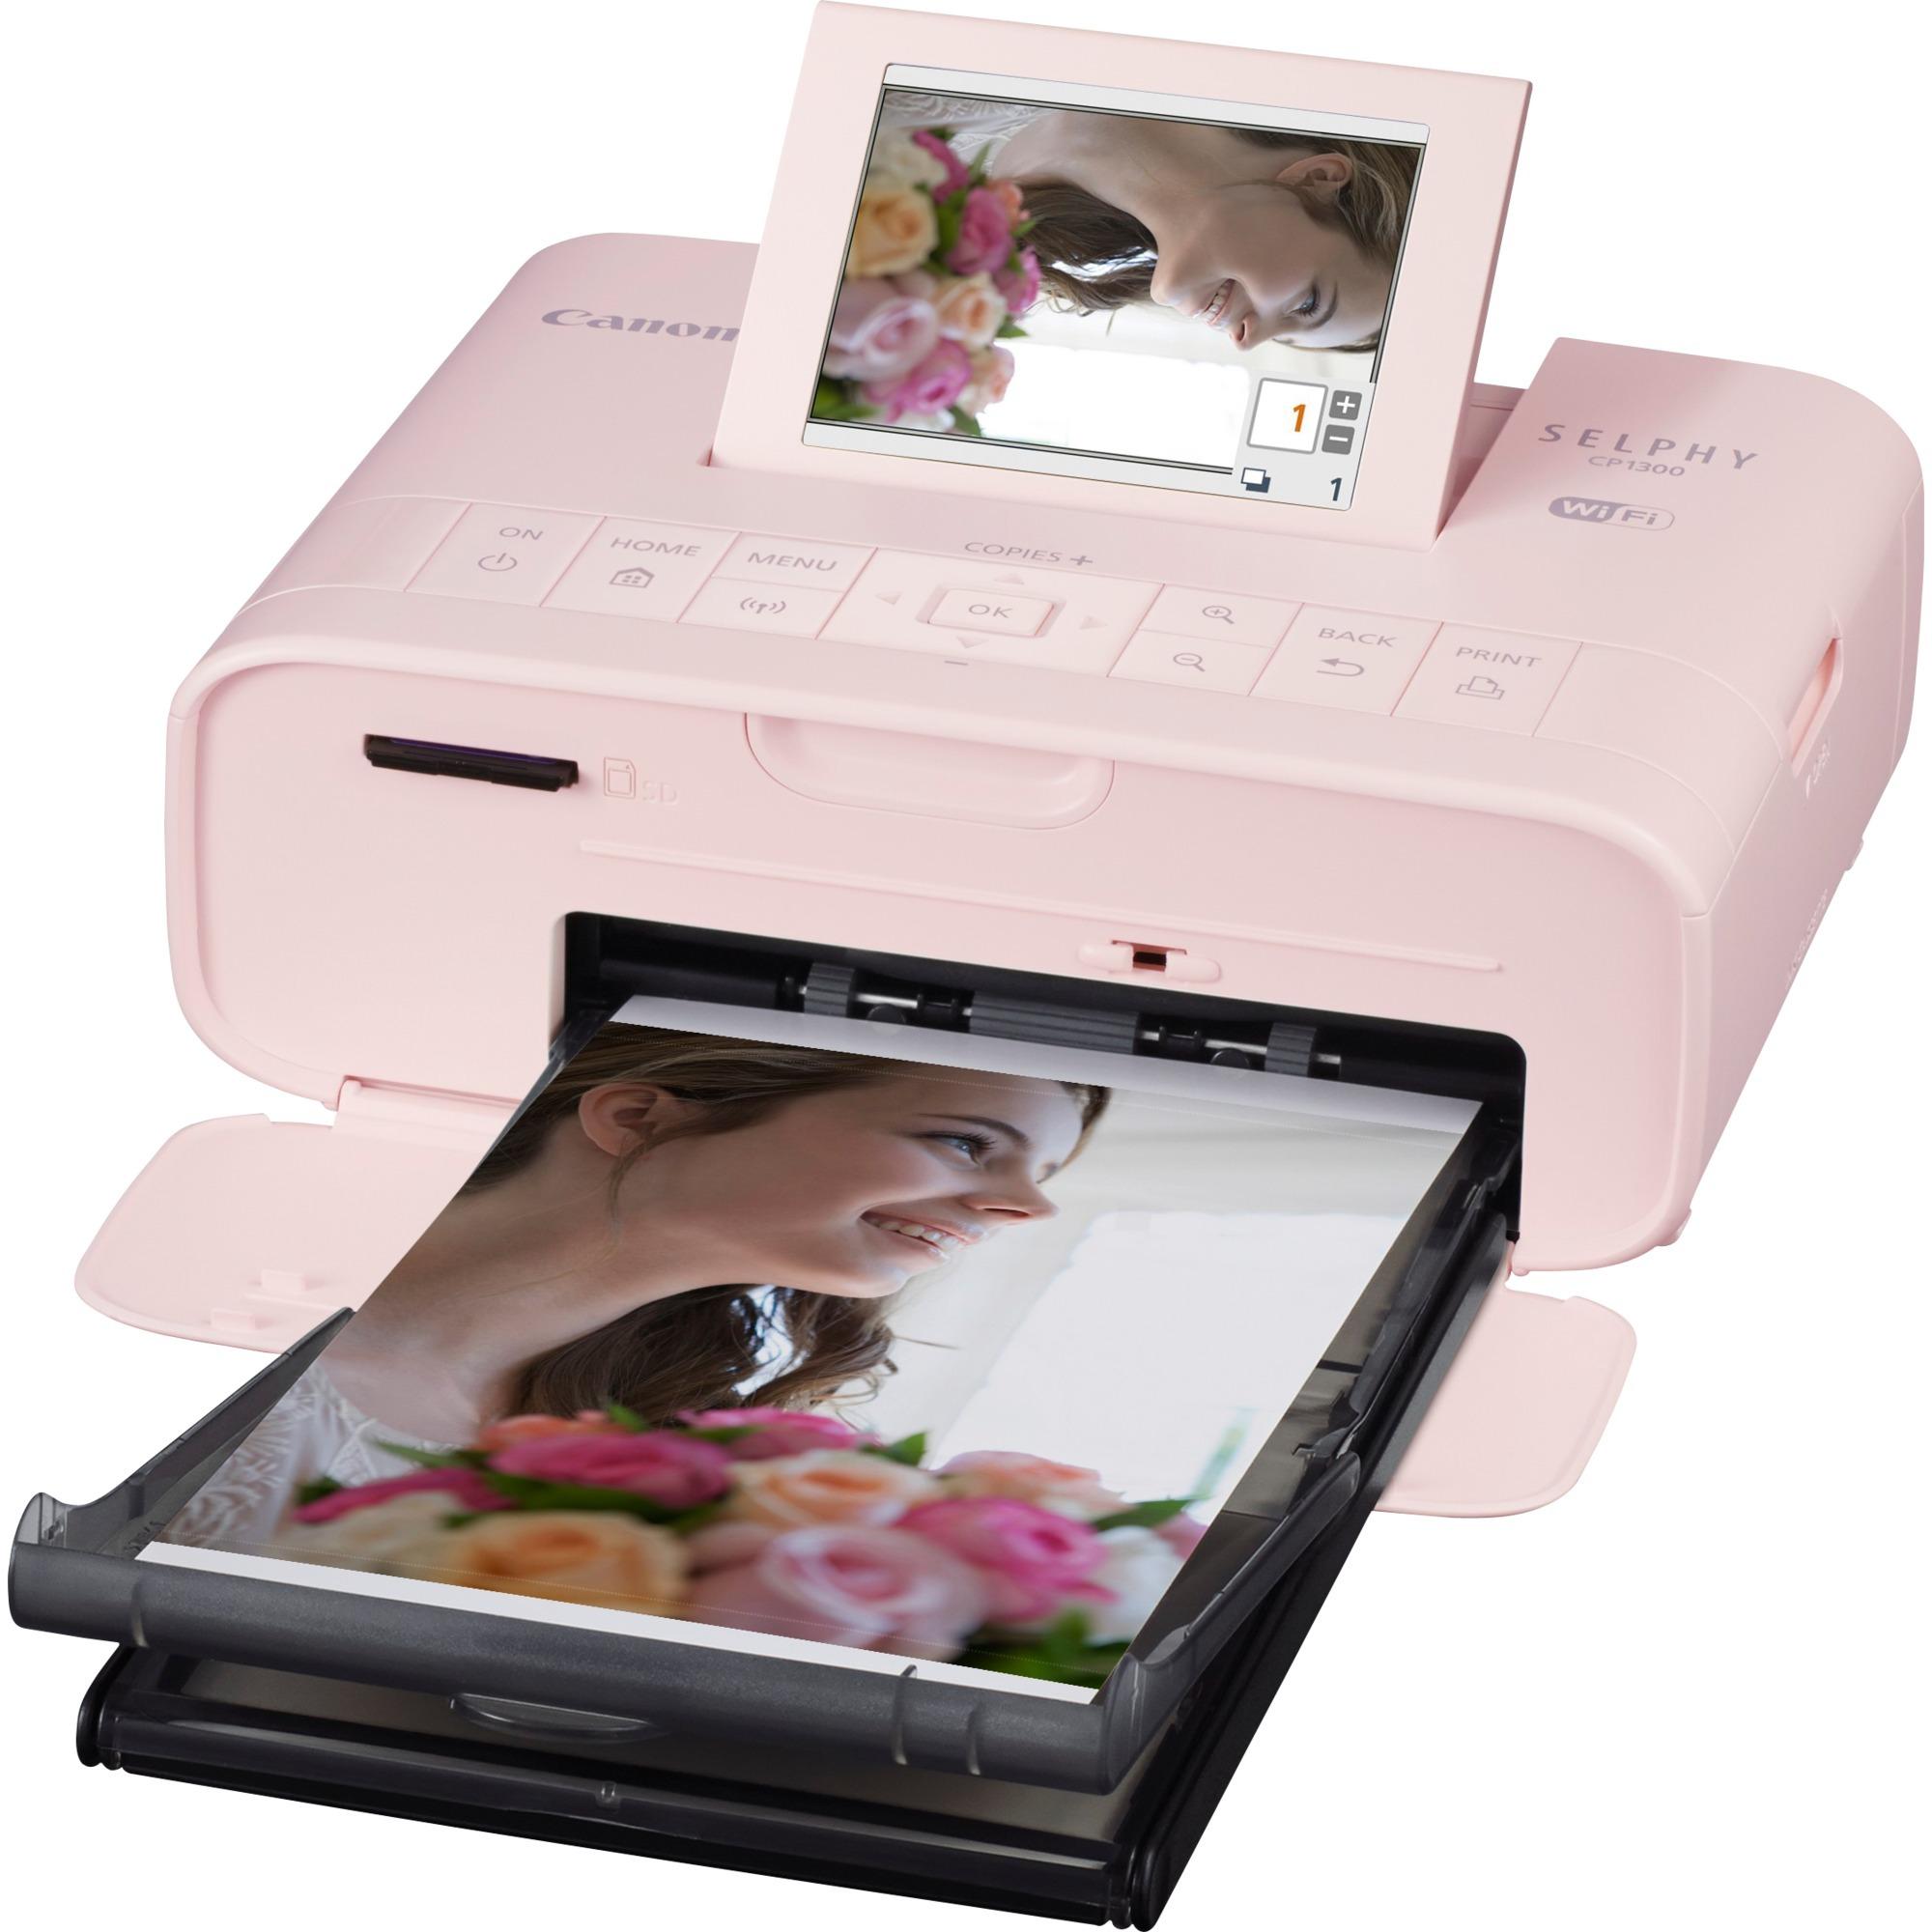 SELPHY CP1300 impresora de foto Pintar por sublimación 300 x 300 DPI Wifi, Impresora de fotos